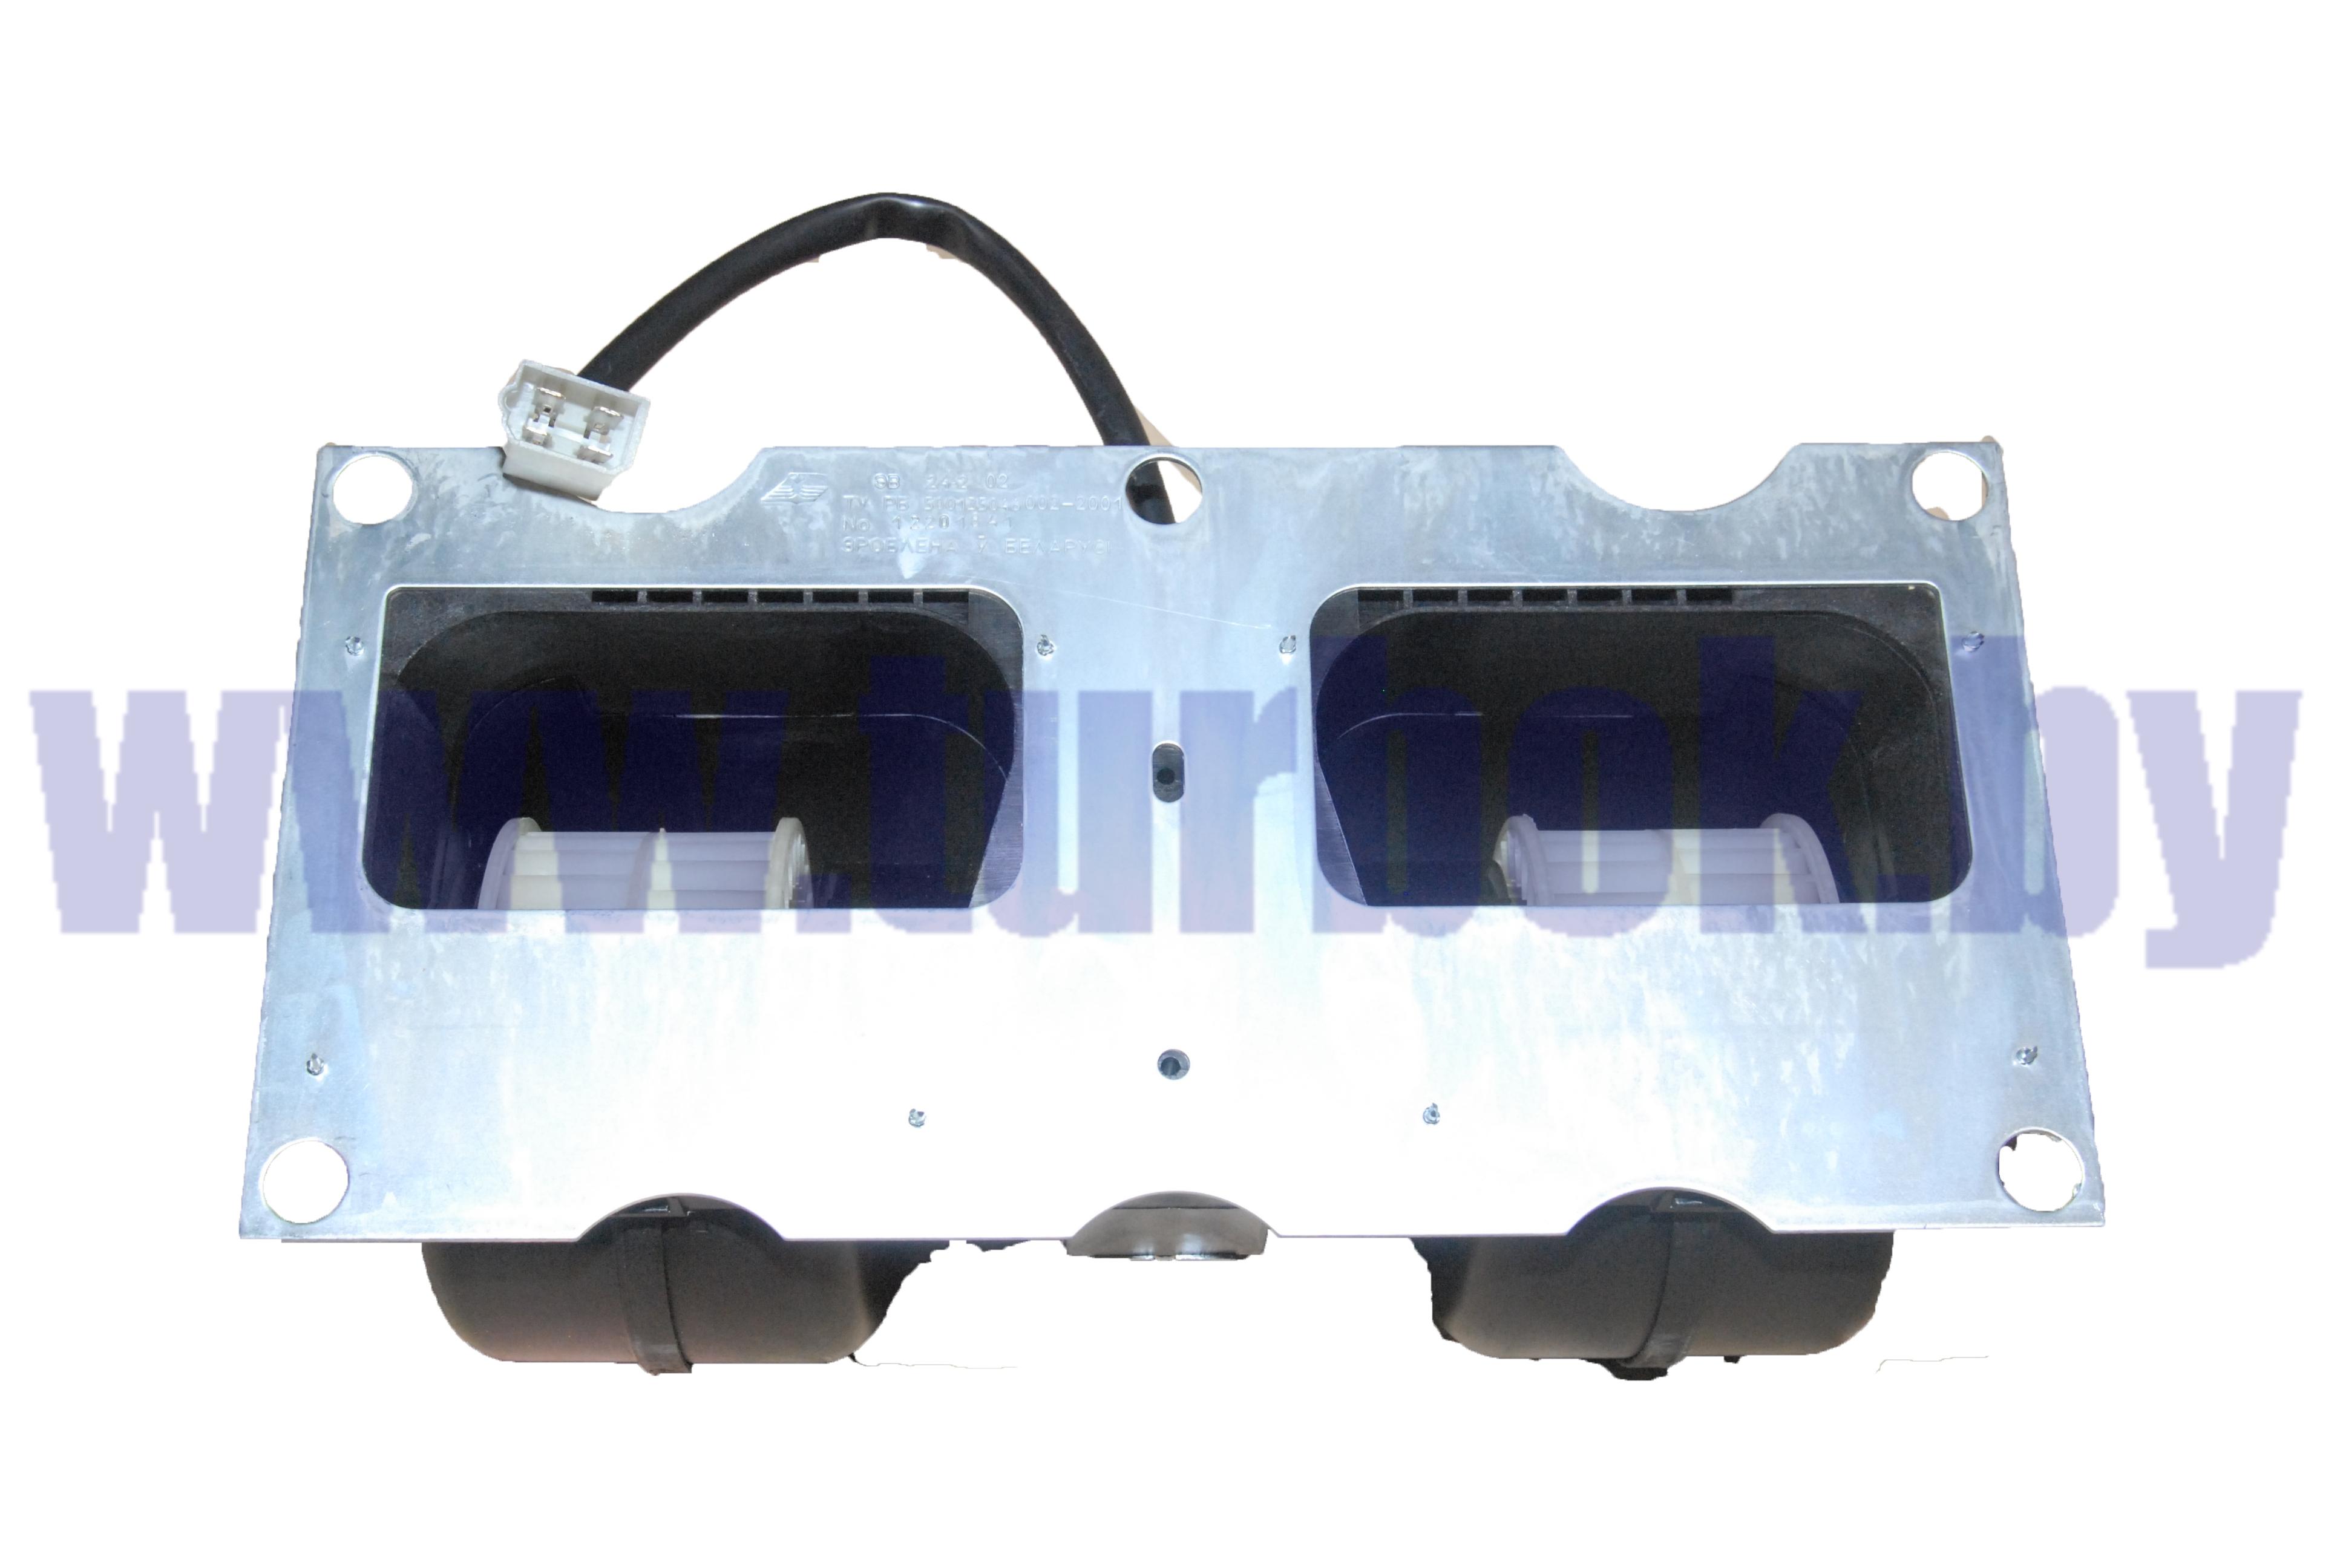 Блок вентиляторный отопителя (на 2 улитки) МАЗ-4370, 650119/ИЖКС.632546.004-01